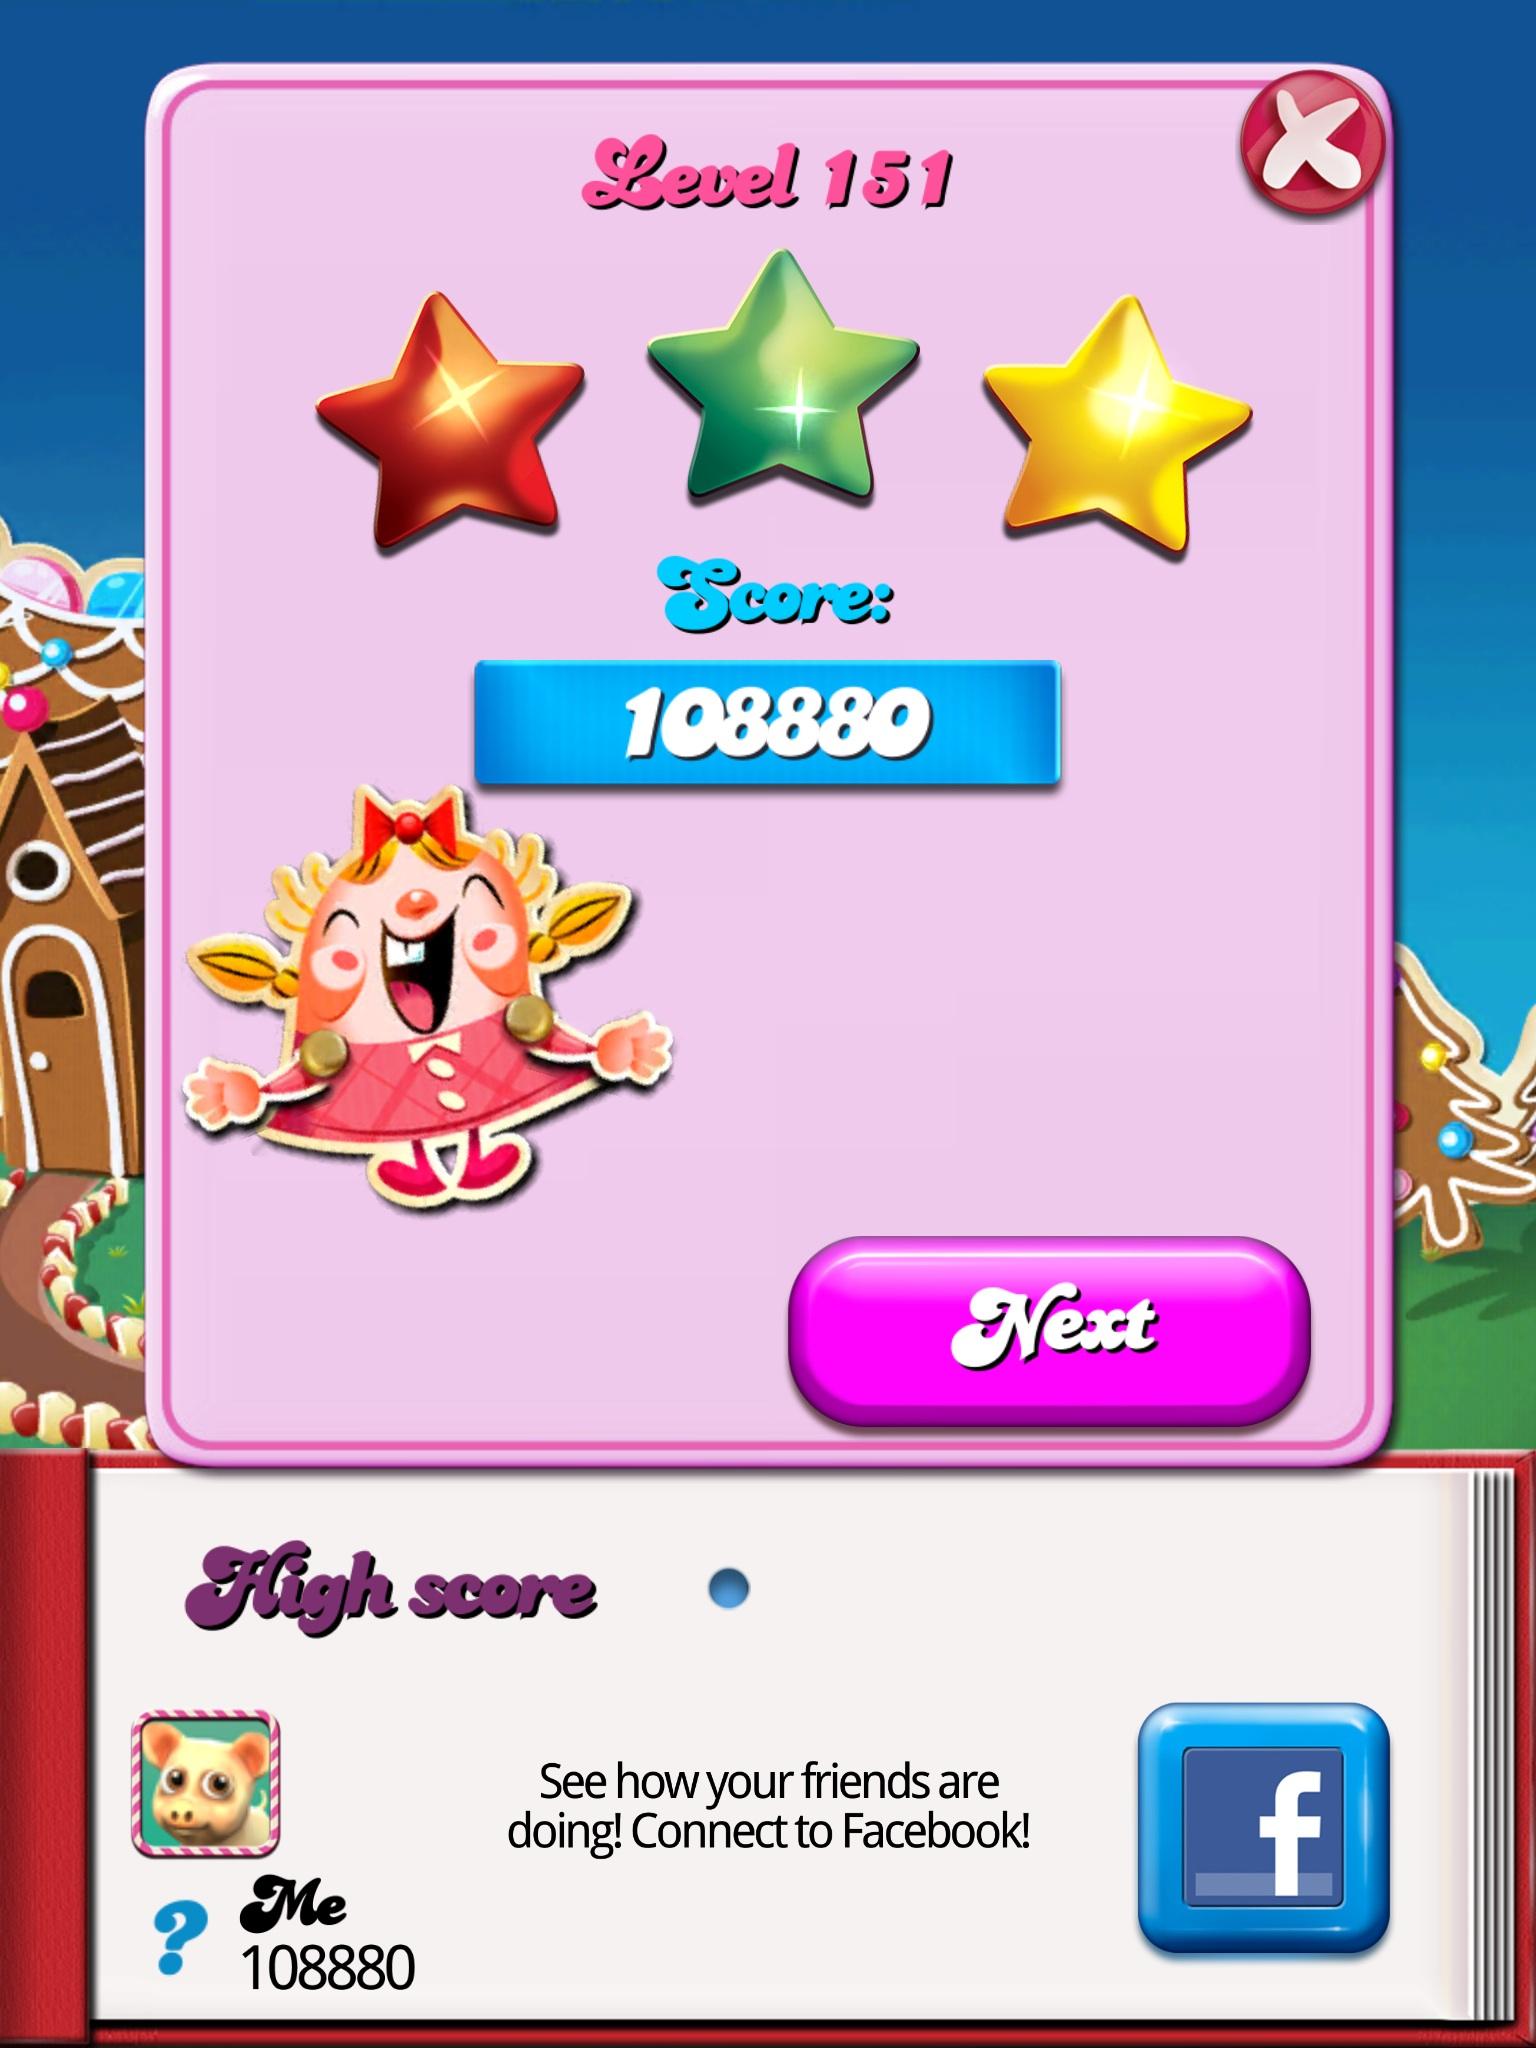 bak2day: Candy Crush Saga: Level 151 (iOS) 108,880 points on 2014-07-21 04:10:40